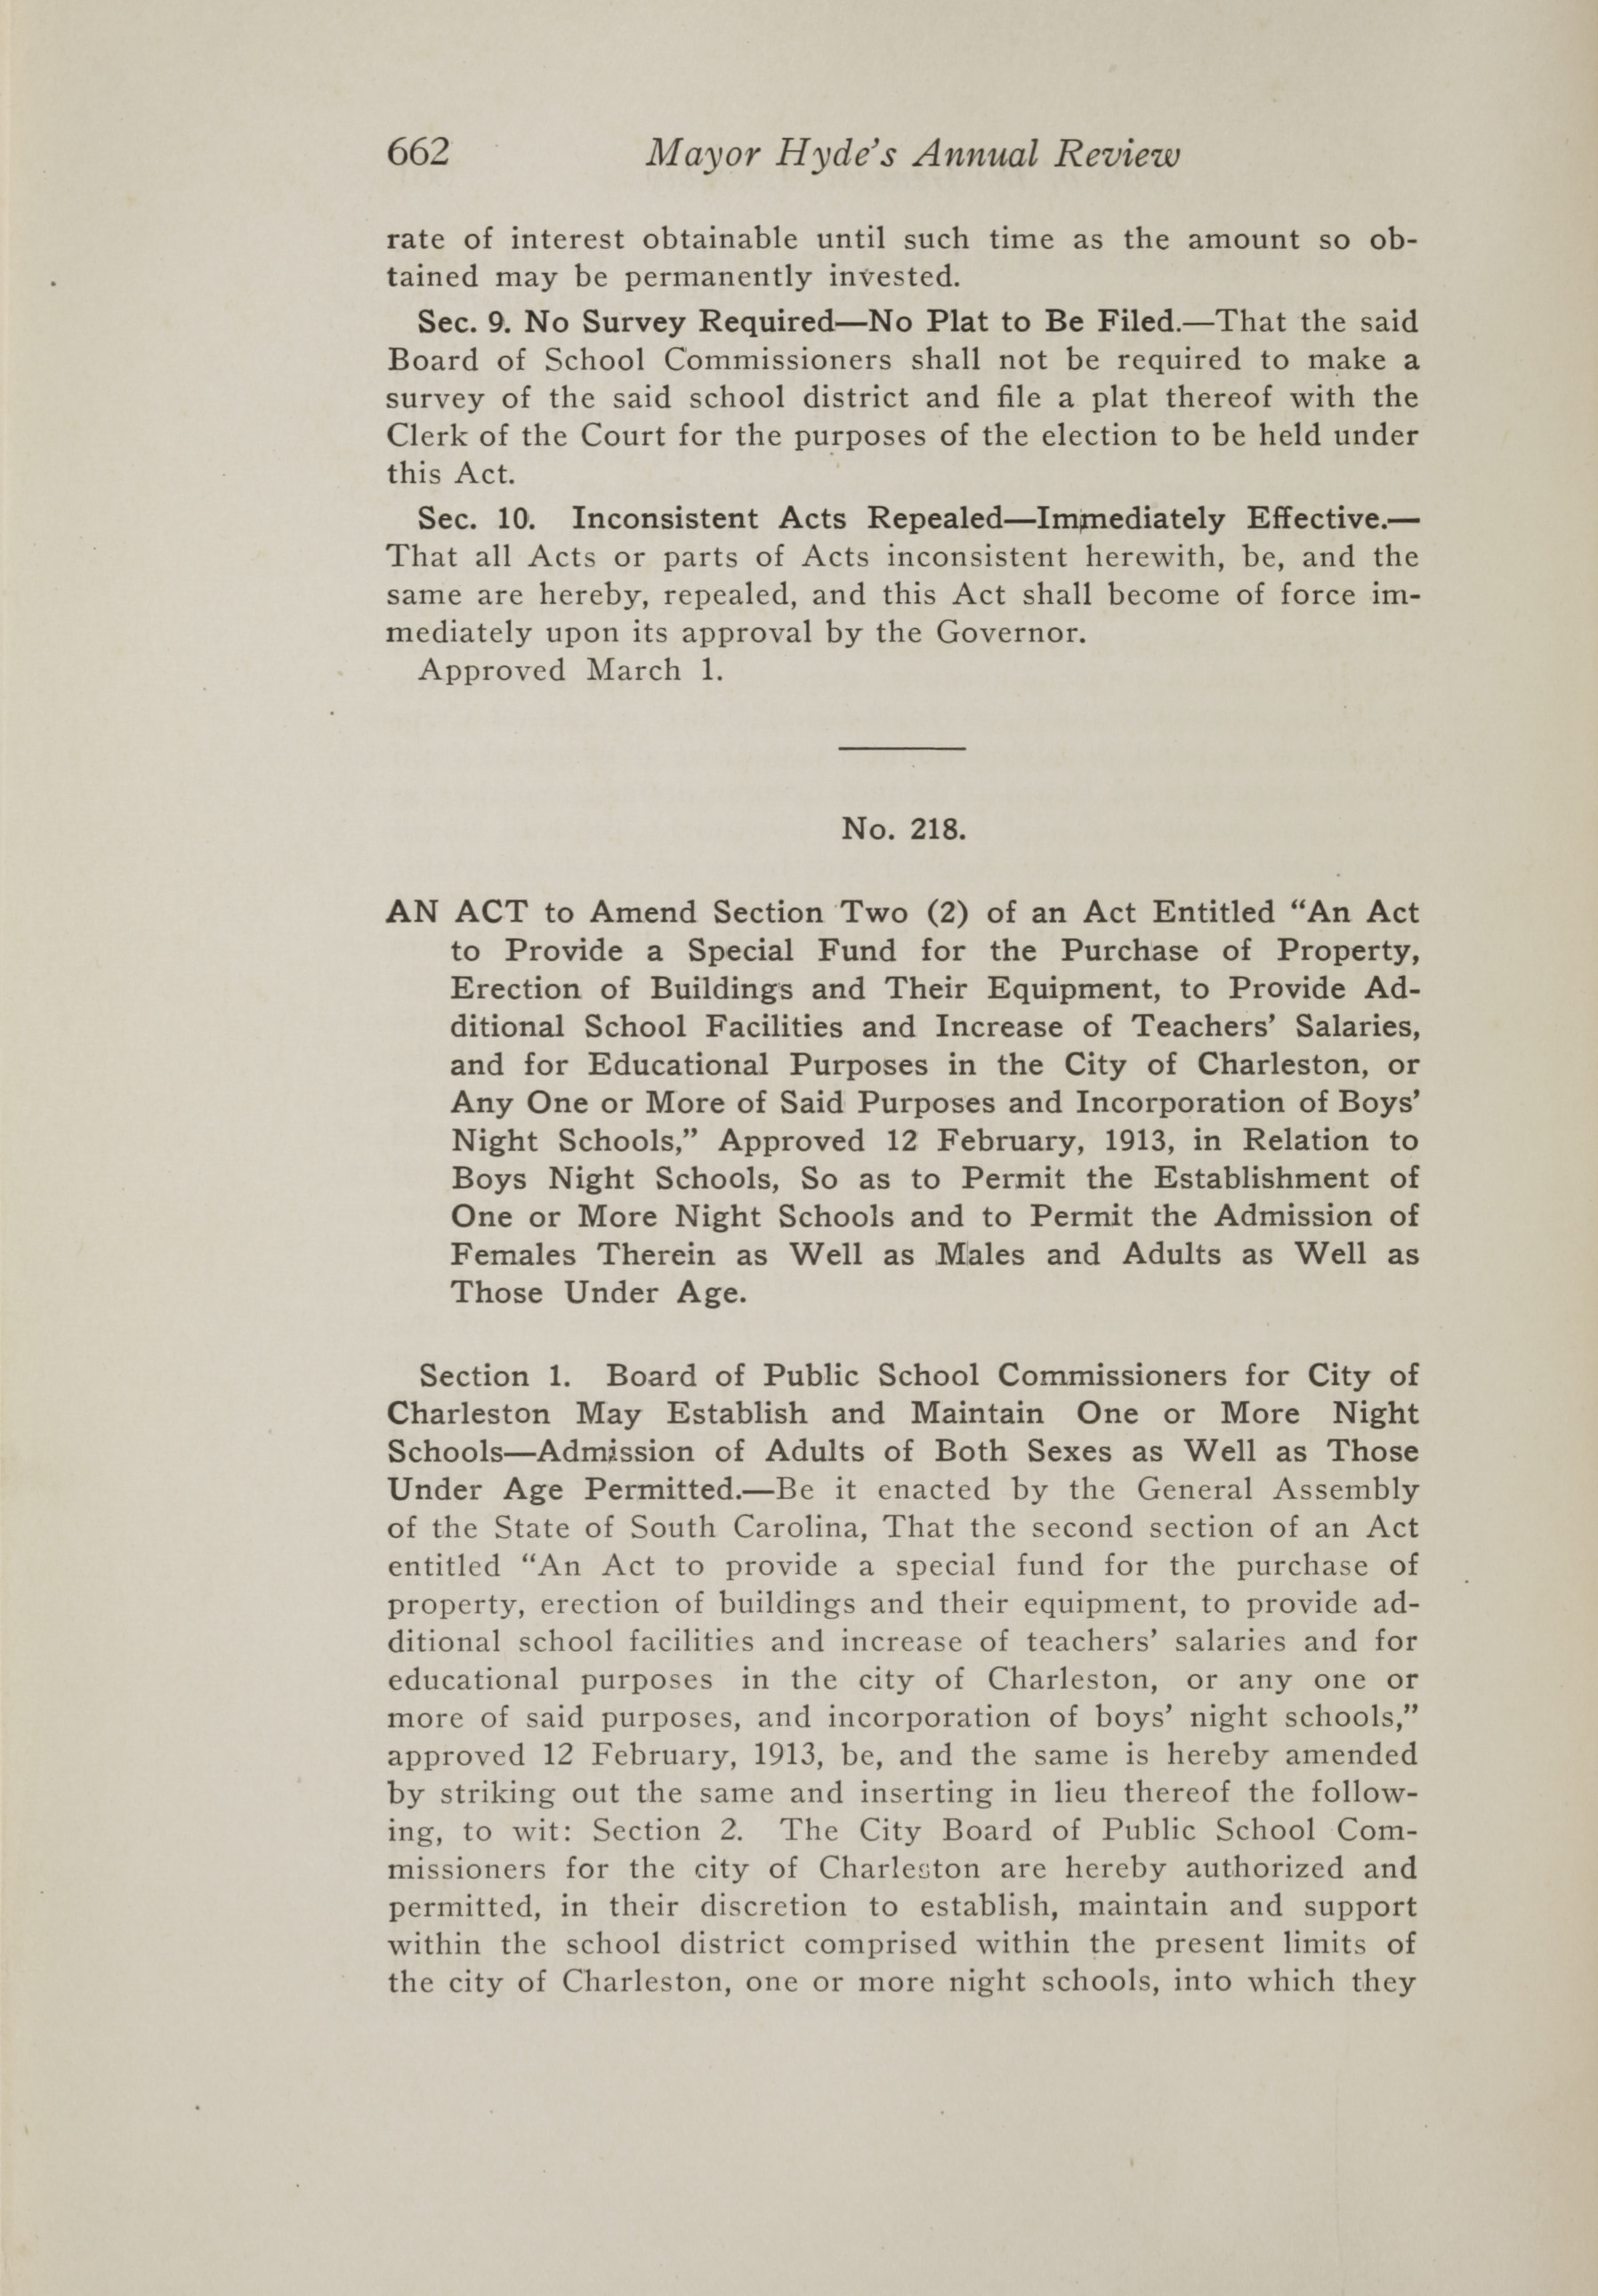 Charleston Yearbook, 1917, page 662